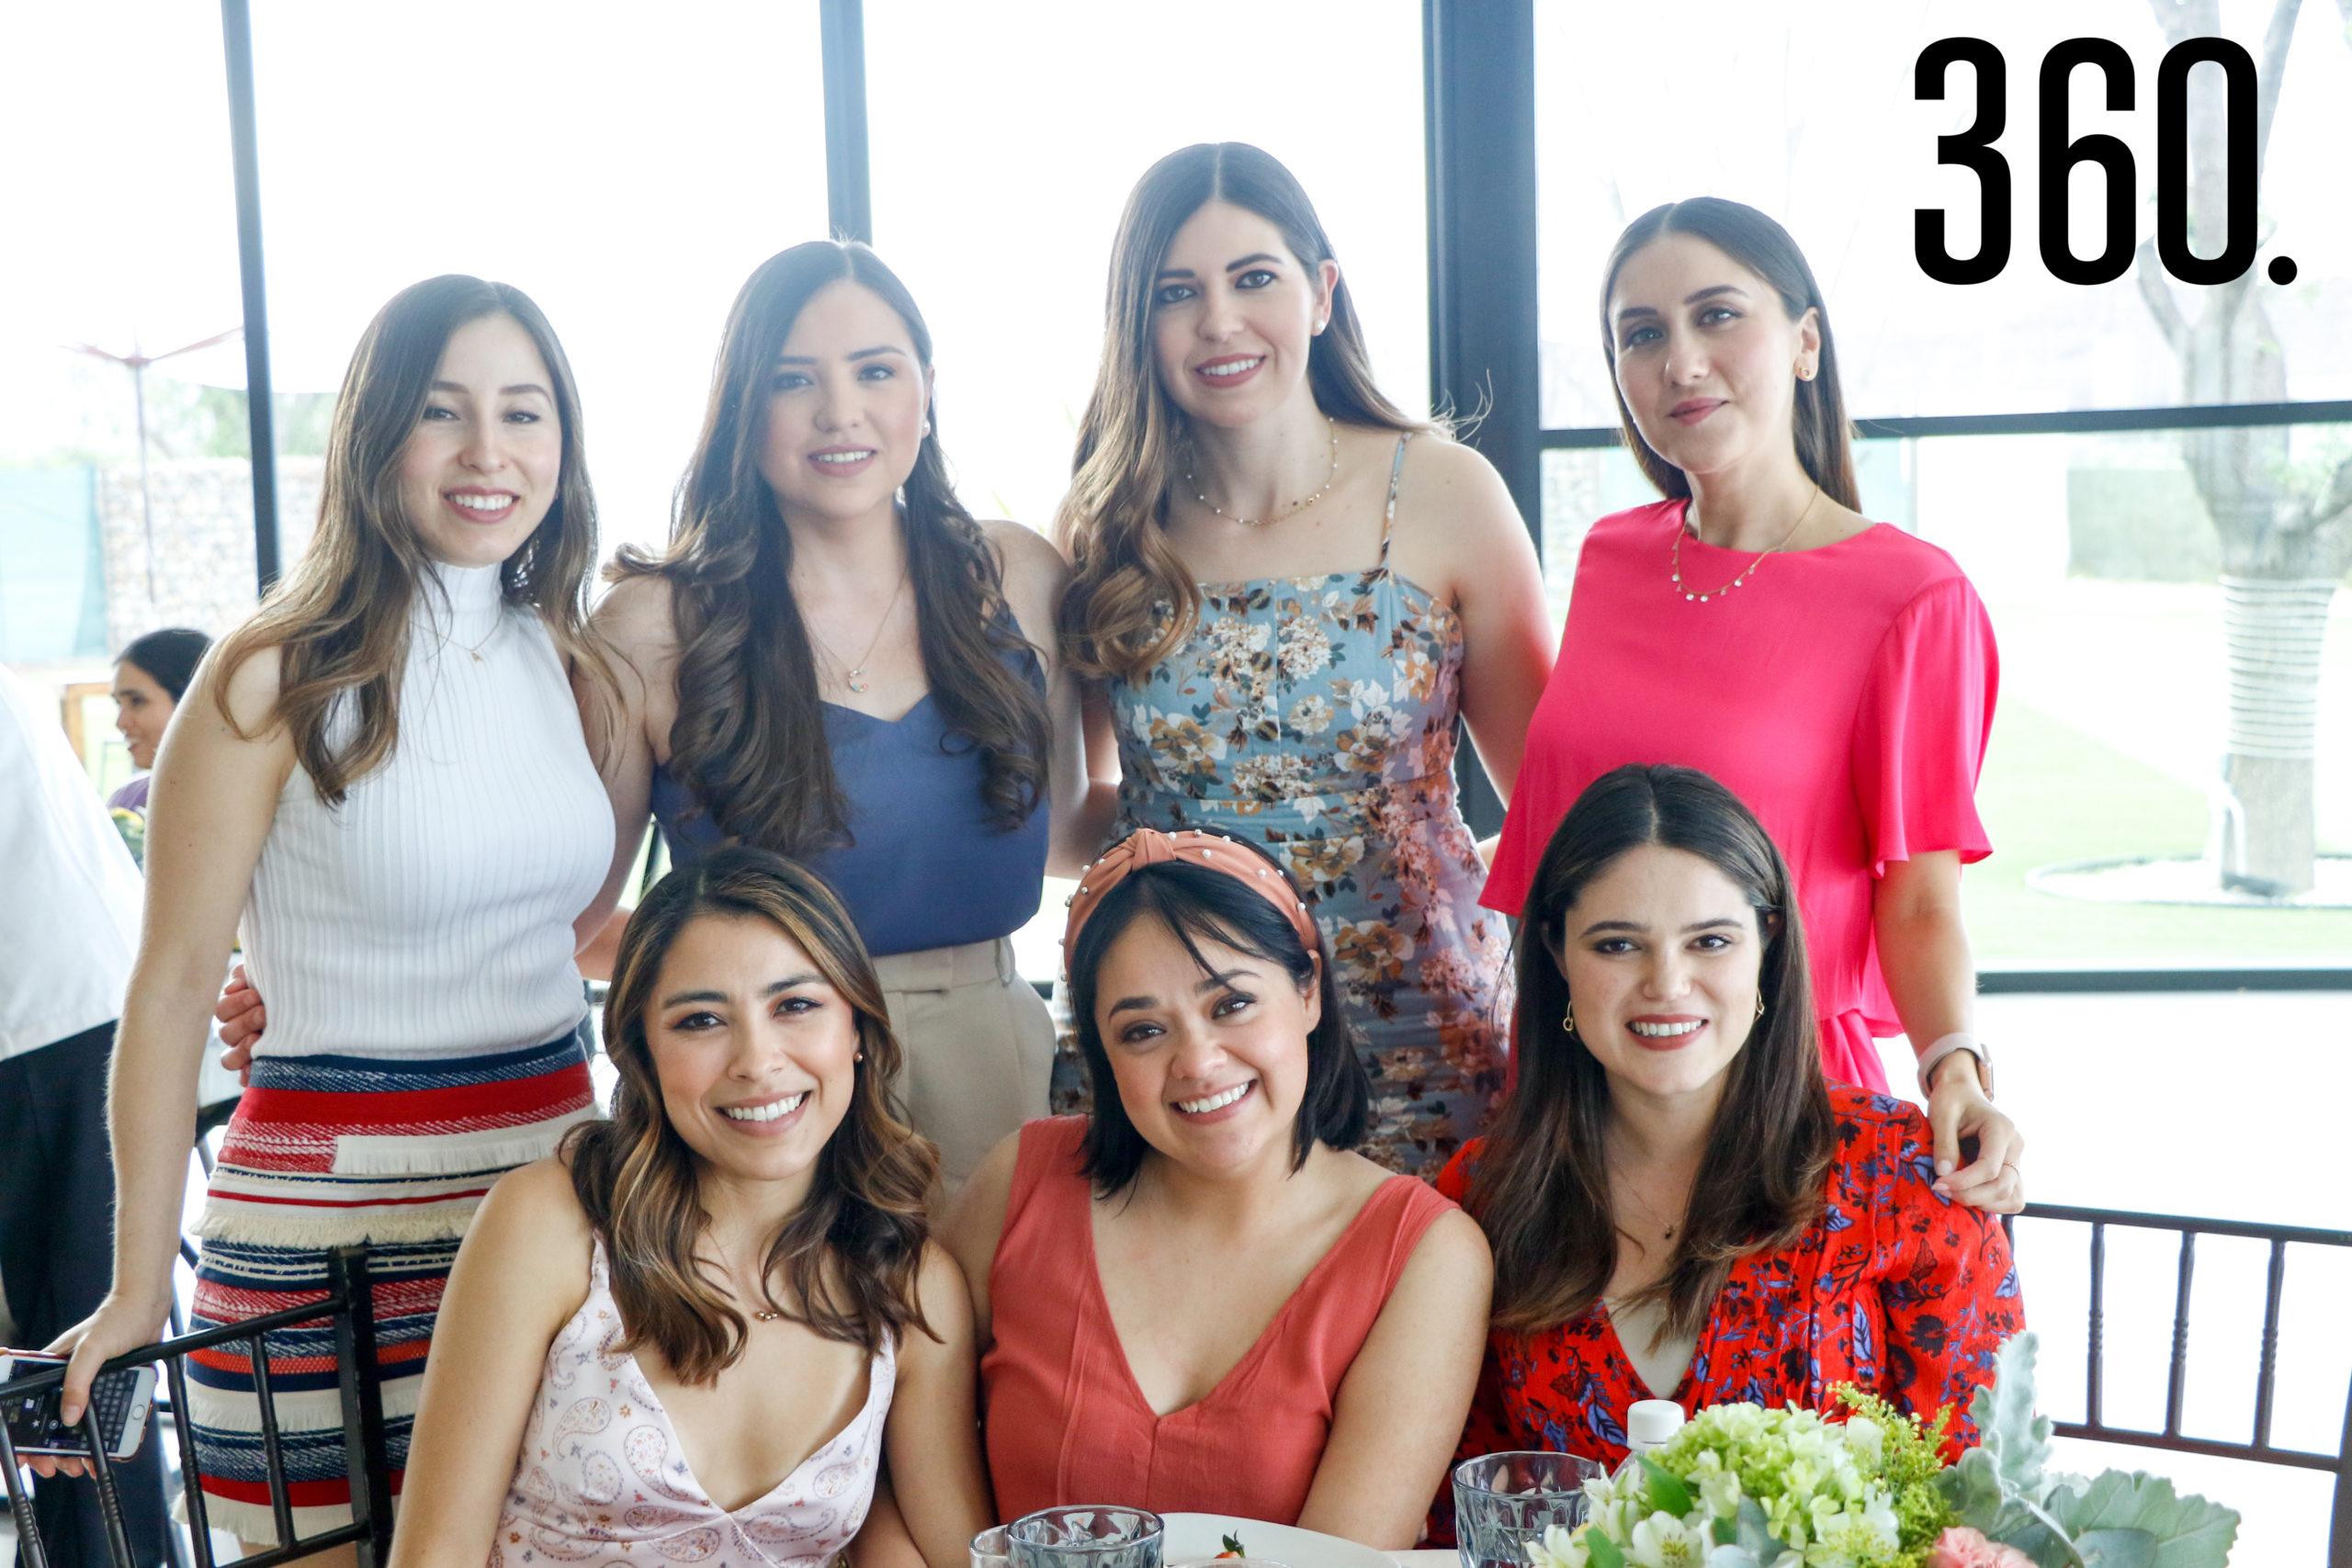 Alba Flores, Ana Lucía Peart, Claudia Valdez, Marifer Garza, Christy Saldaña, Ana Laura Yamamoto y Annie Aguirre.